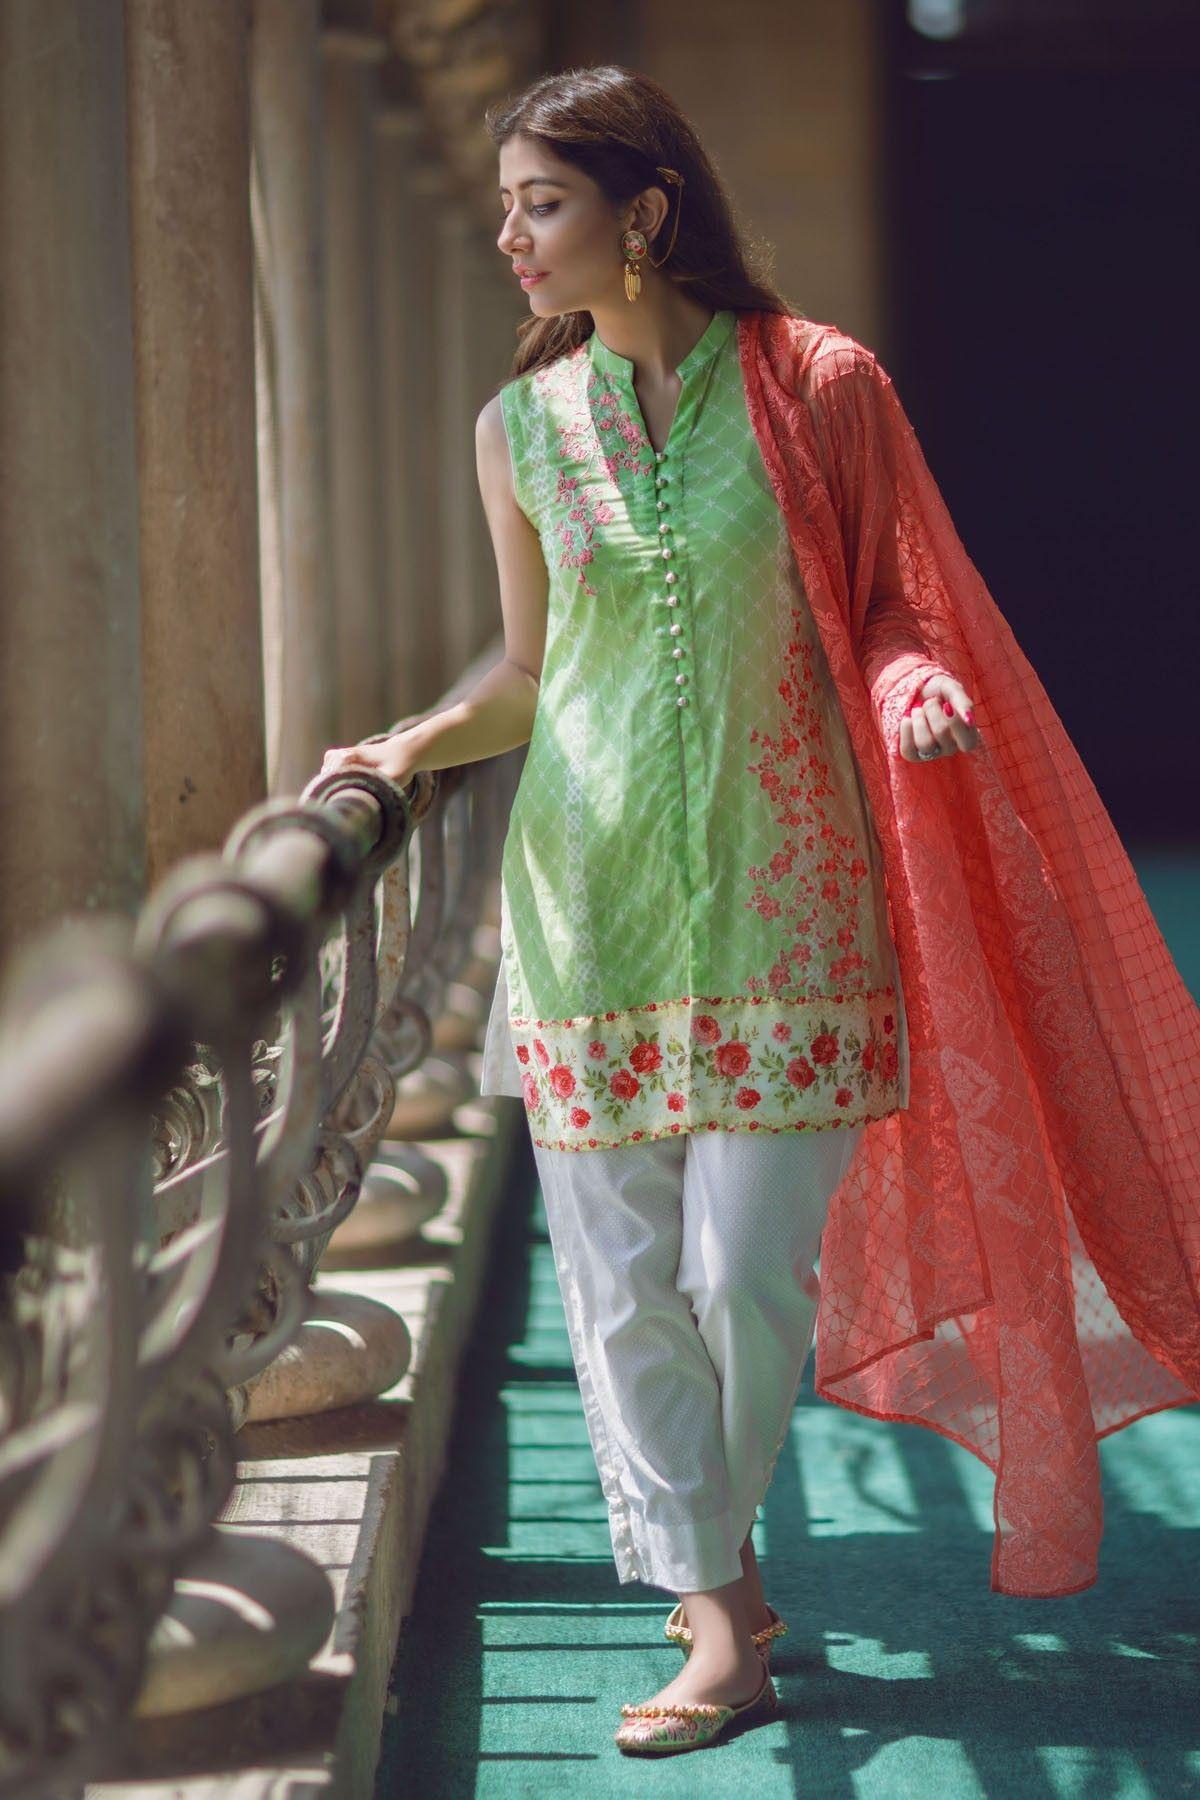 Shirt design lawn - Shirt Fabric Embroidered Lawn Shirt Shalwar Trouser Fabric Printed Trouser Dupatta